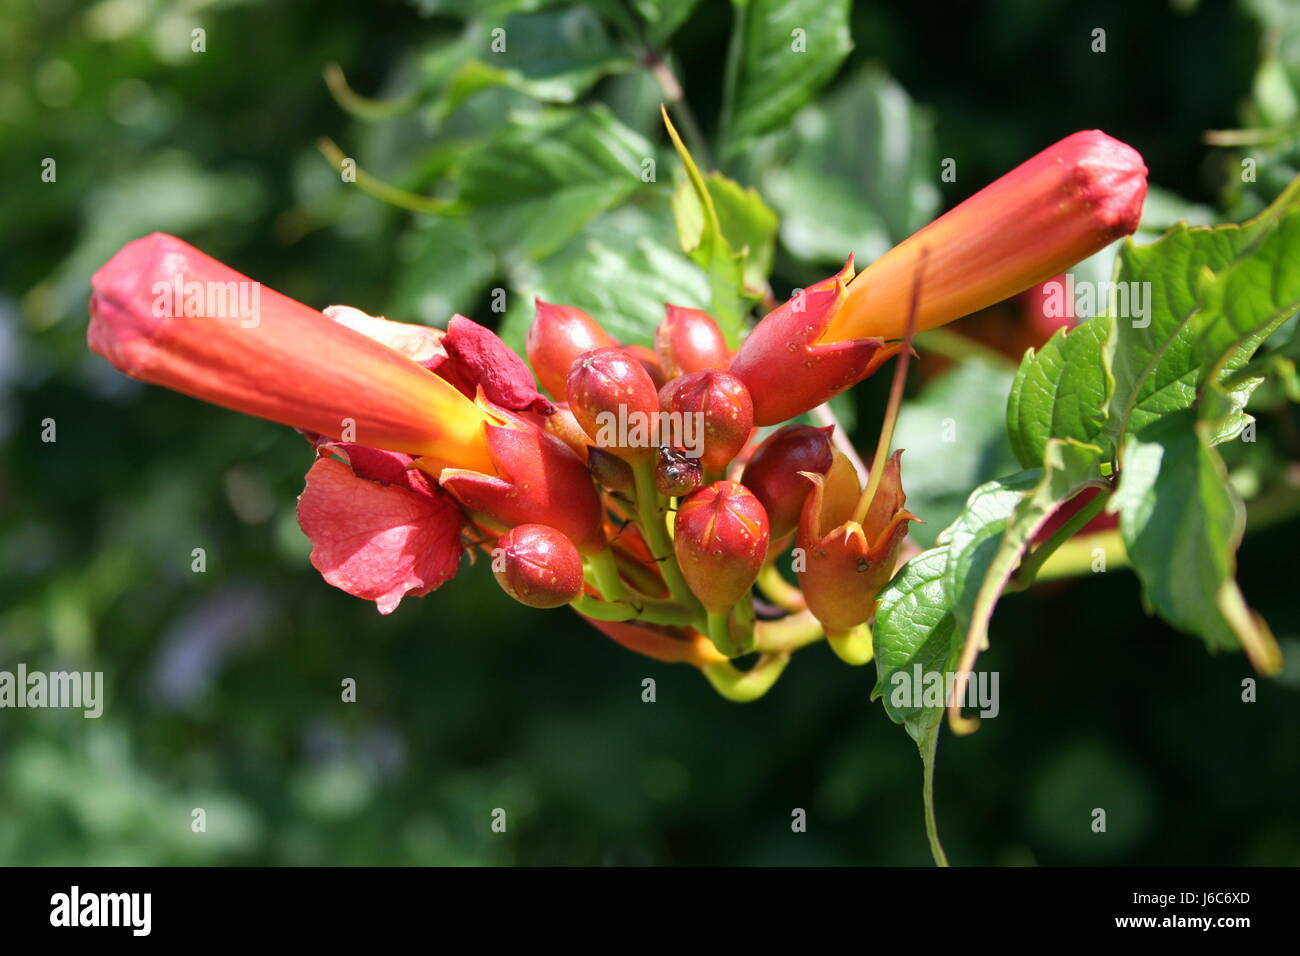 flower plant bloom blossom flourish flourishing bud orange macro close-up macro Stock Photo